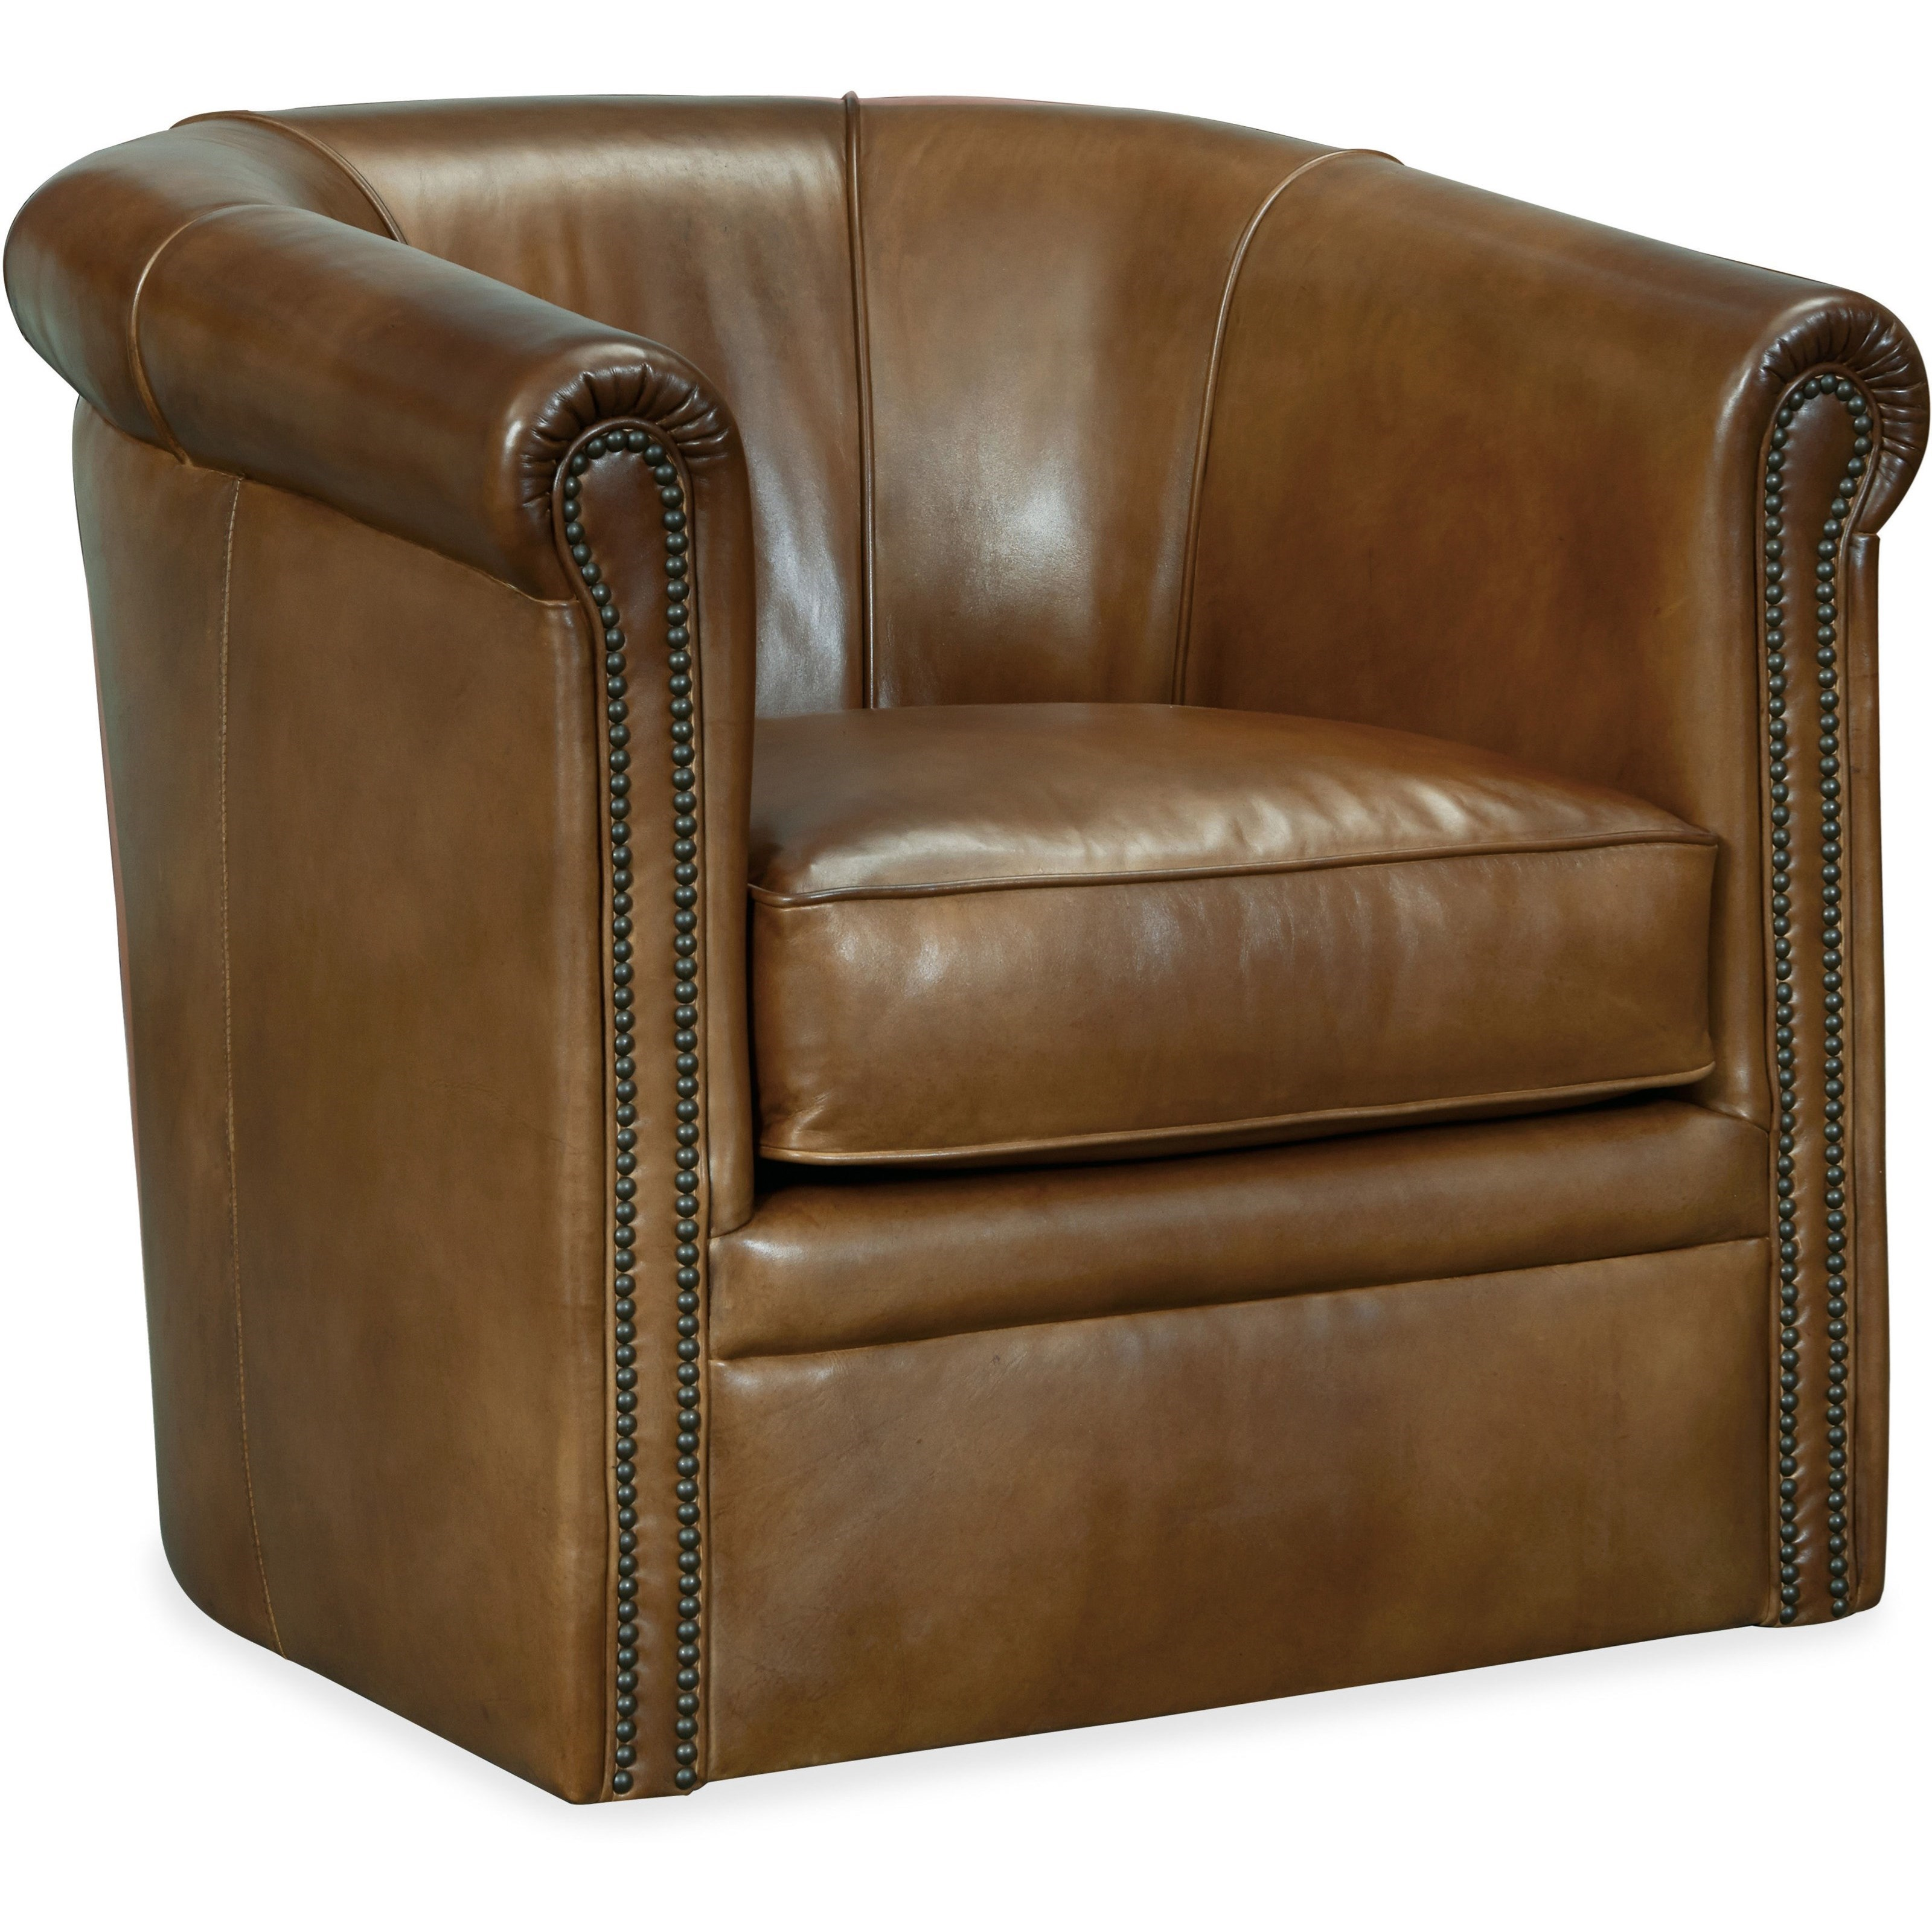 Sensational Club Chairs Axton Swivel Leather Club Chair Spiritservingveterans Wood Chair Design Ideas Spiritservingveteransorg